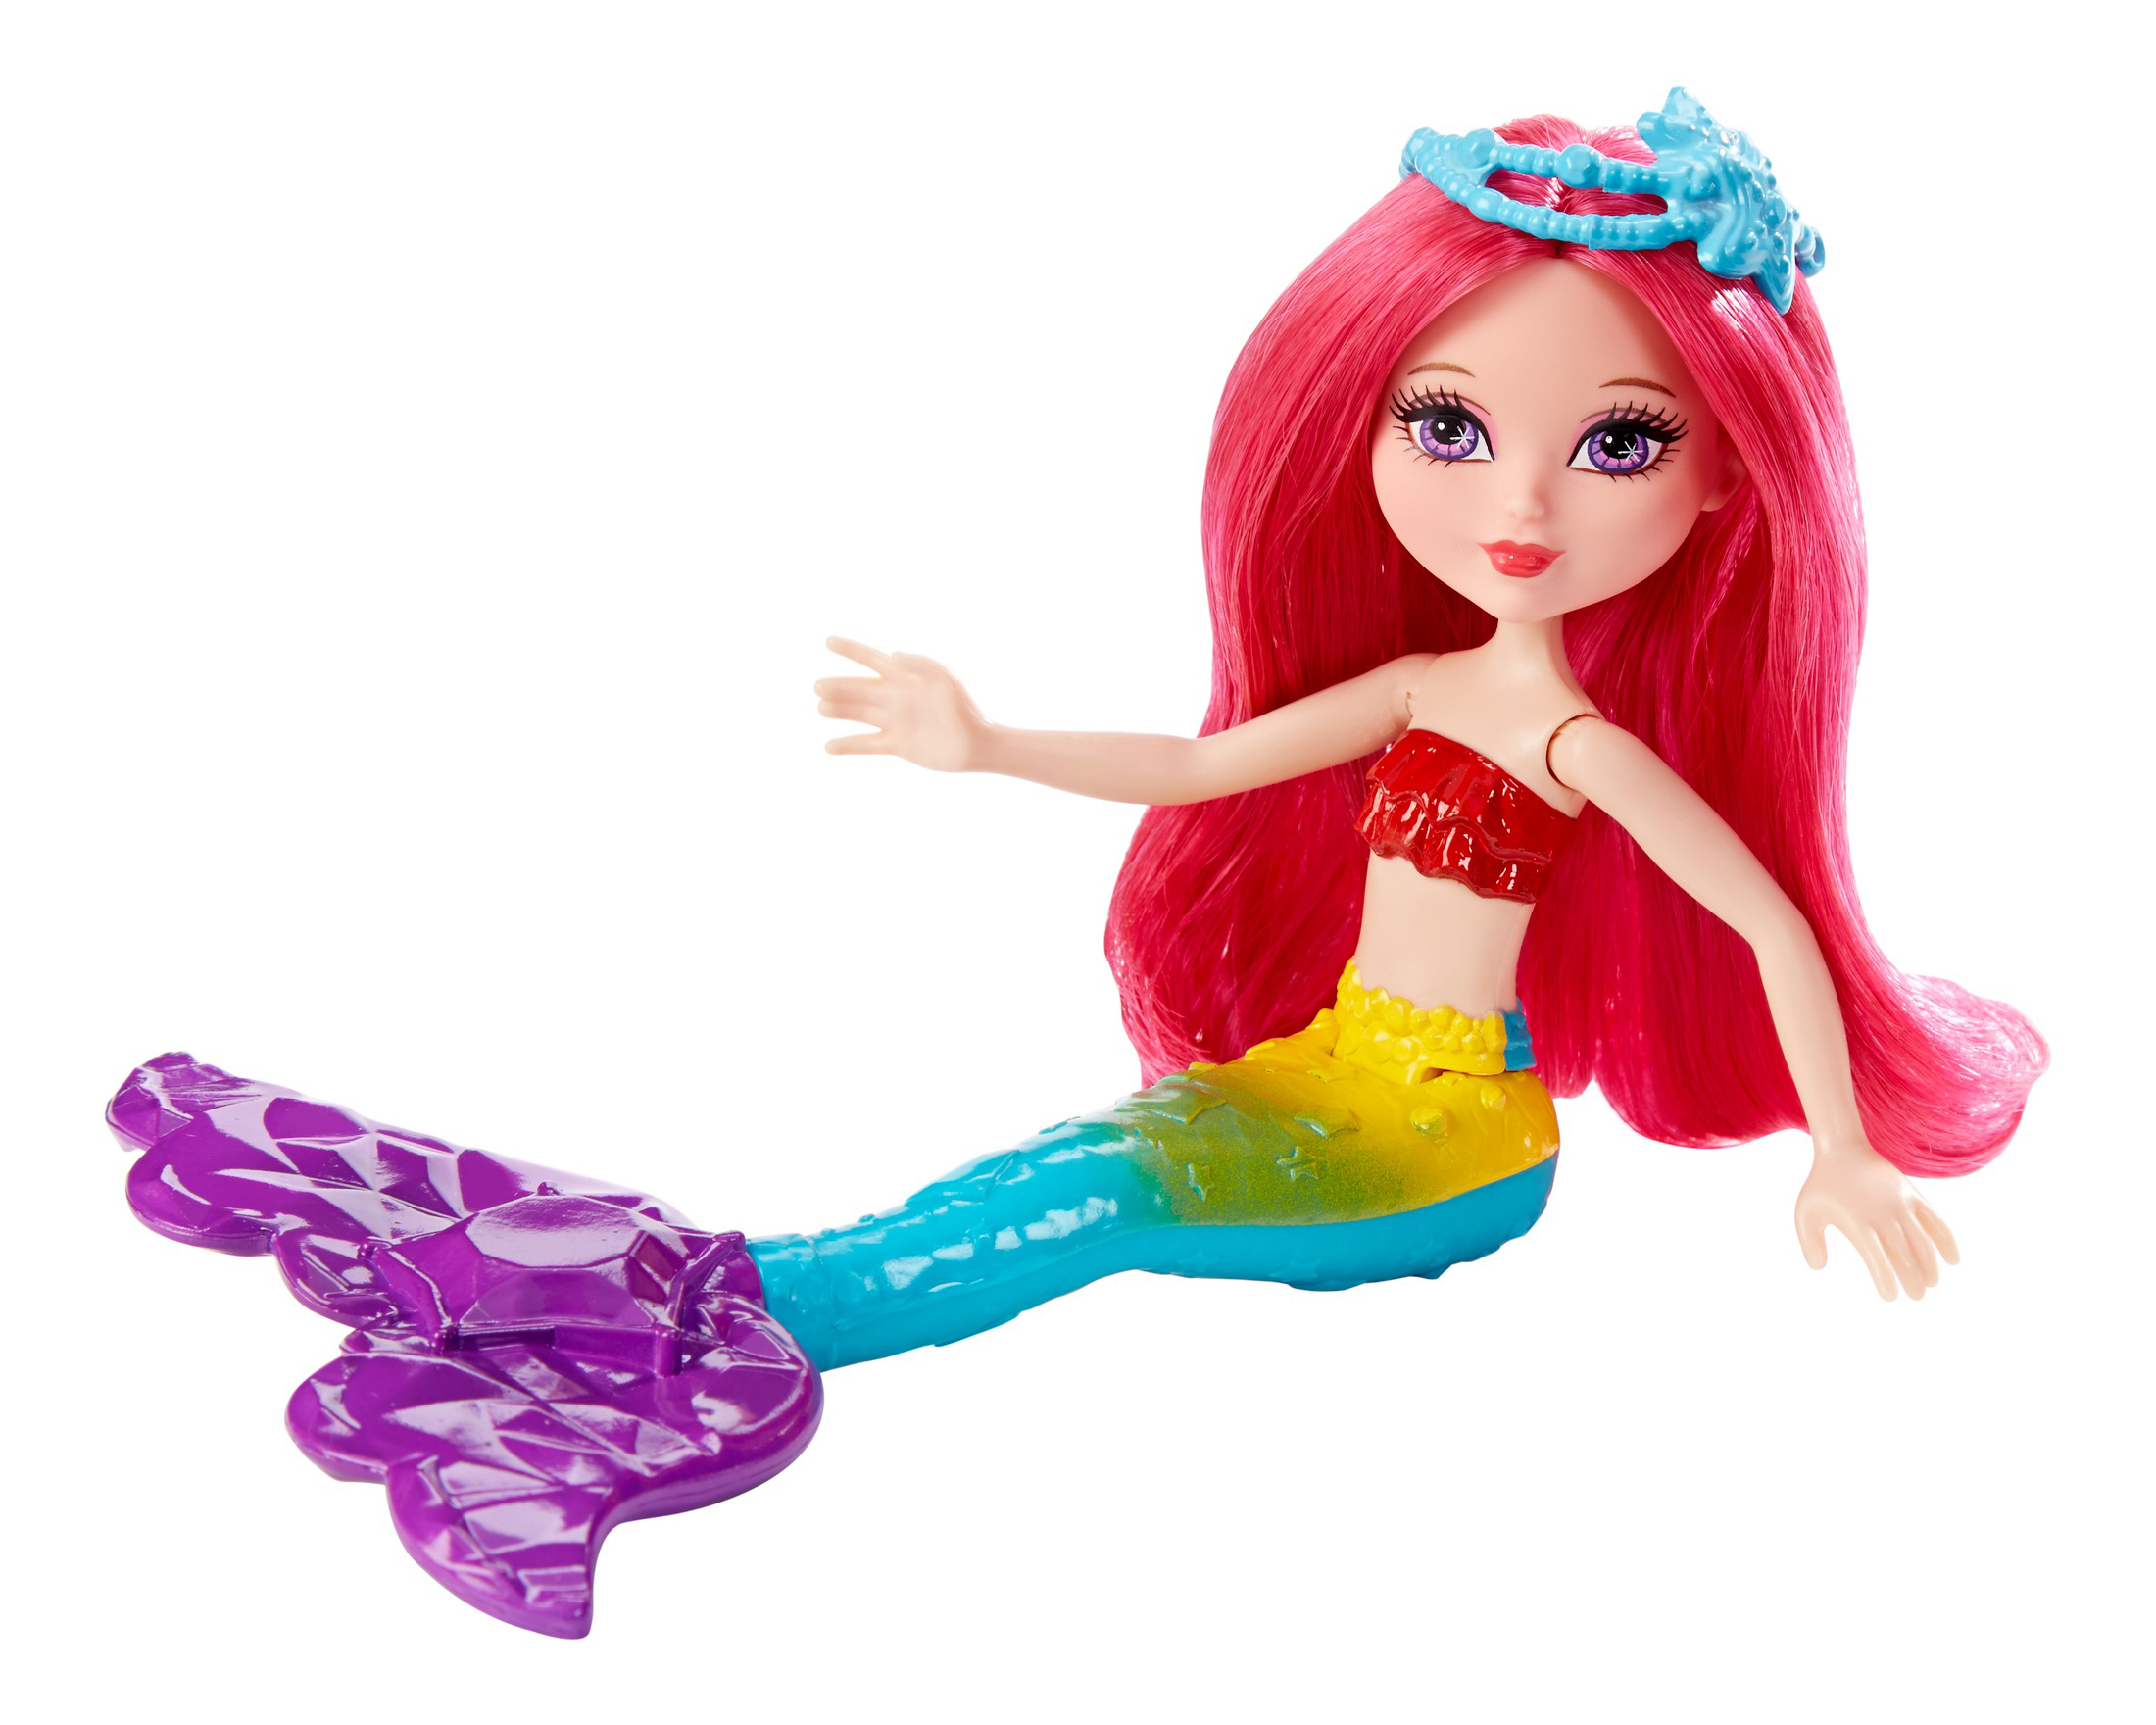 Купить Mini Mermaid Rainbow Doll, Кукла Barbie Маленькая русалочка с красными волосами DNG07 DNG08, Куклы Barbie